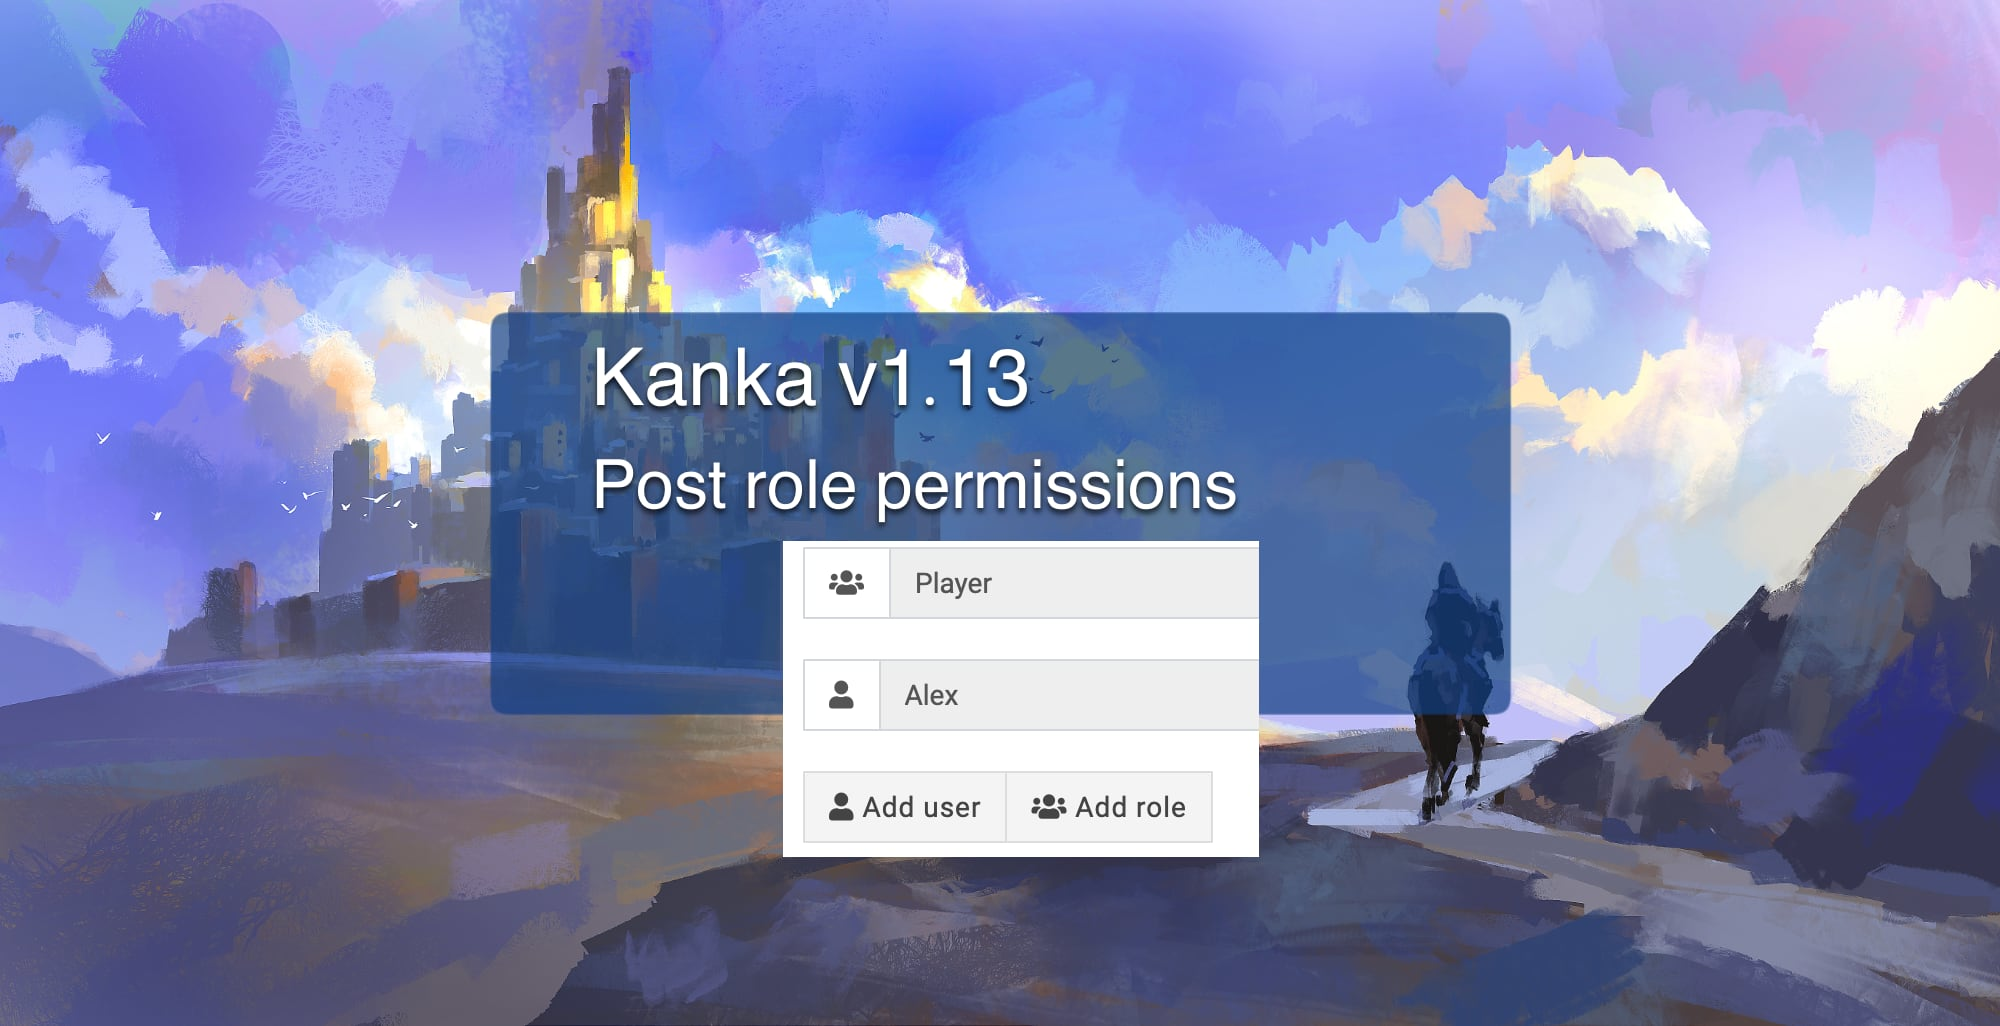 Kanka 1.13 post role permissions